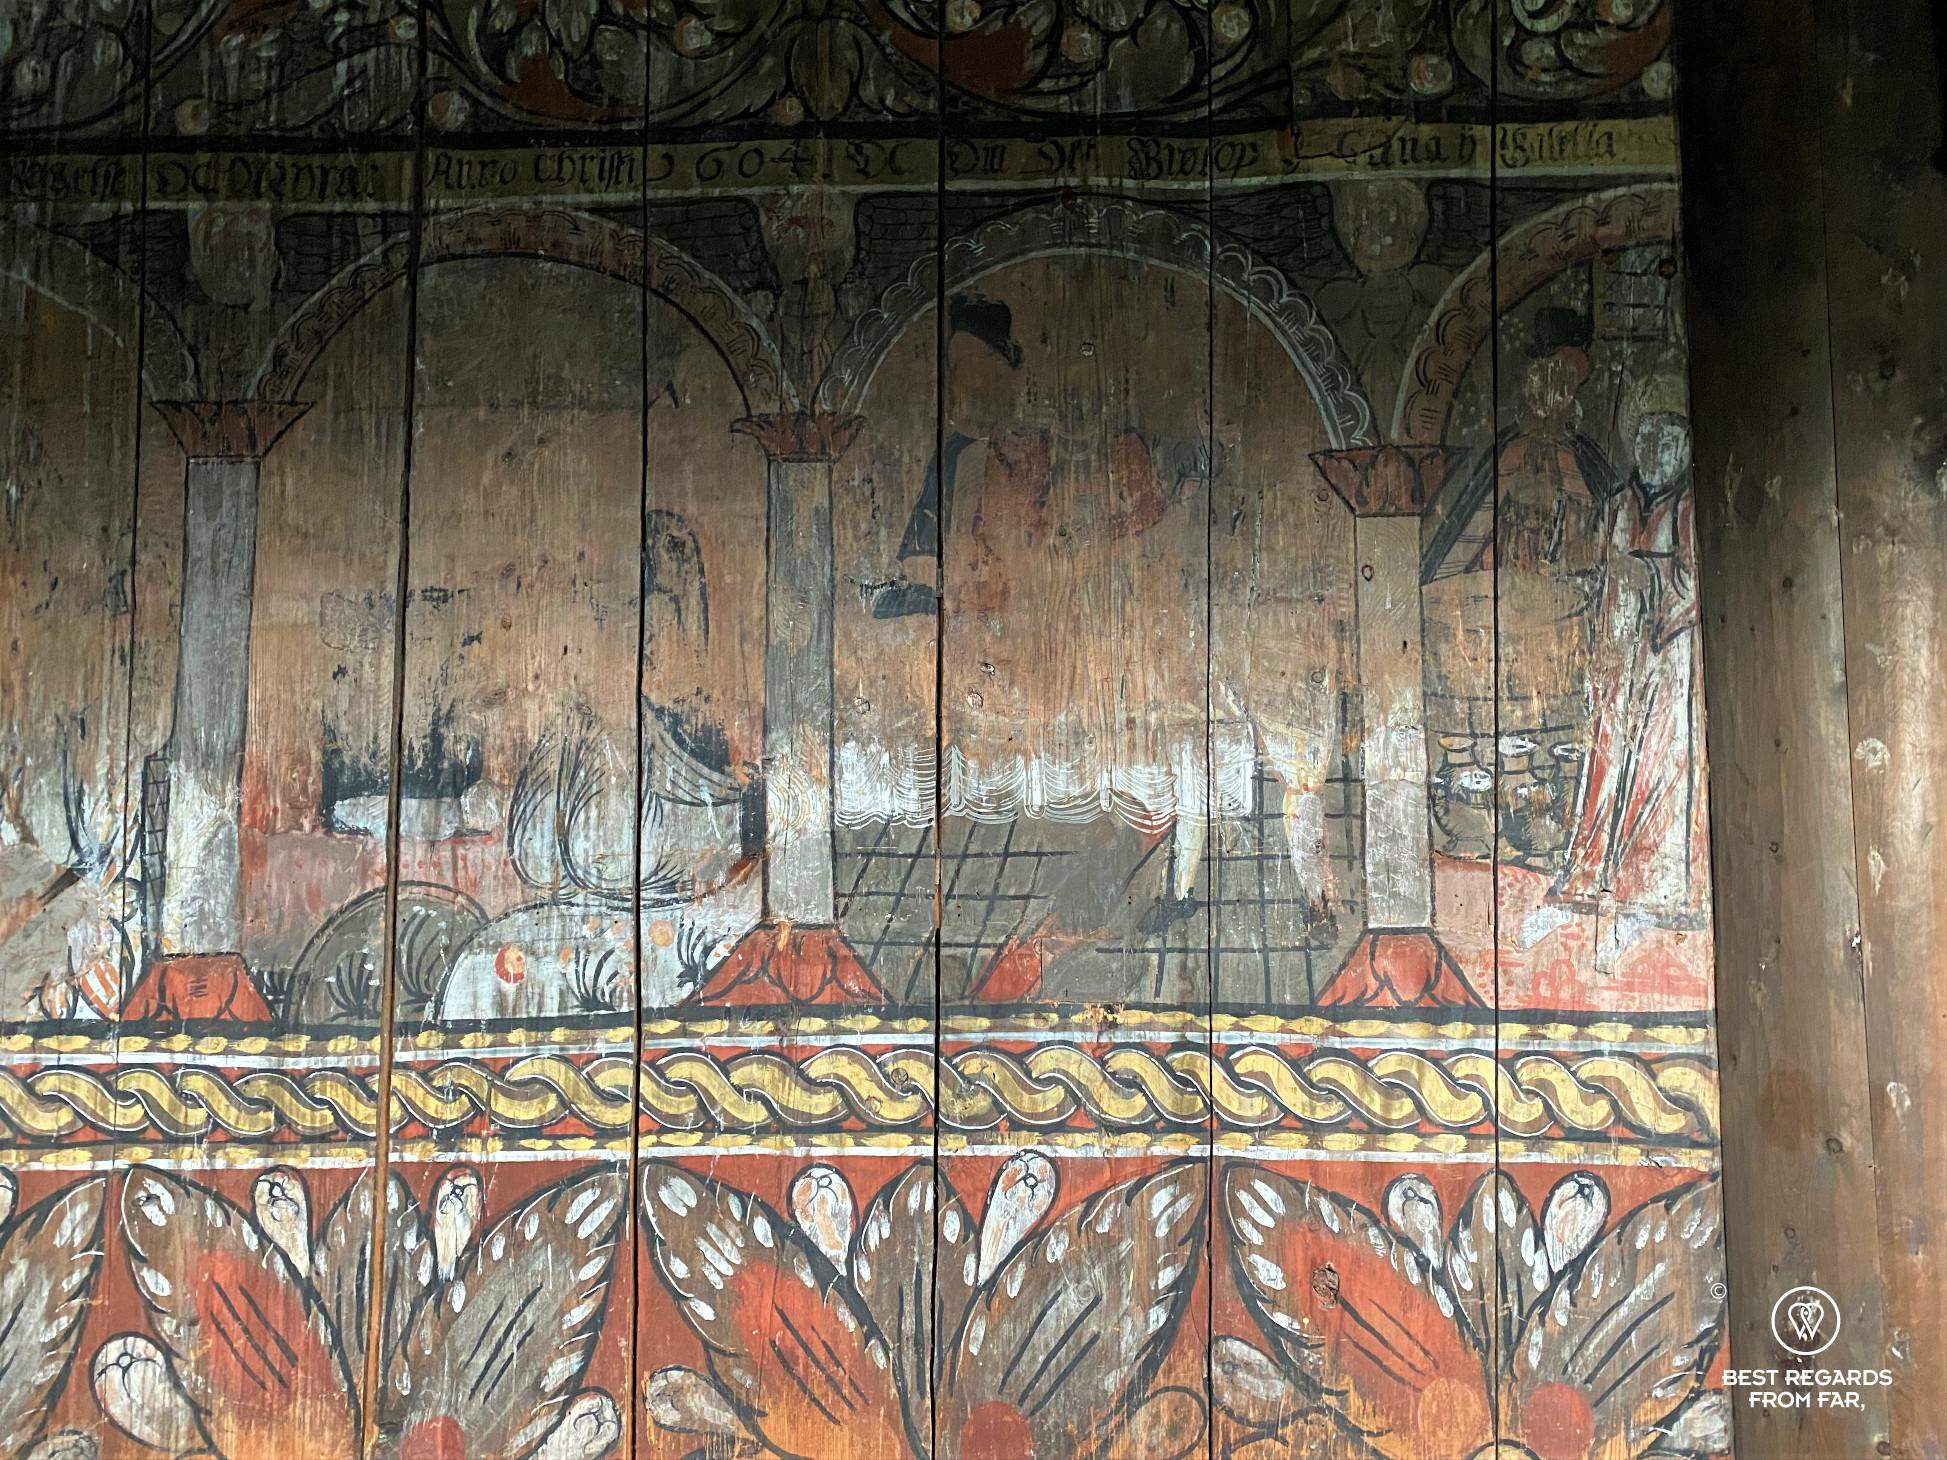 Paintings inside Eidsborg Stave Church